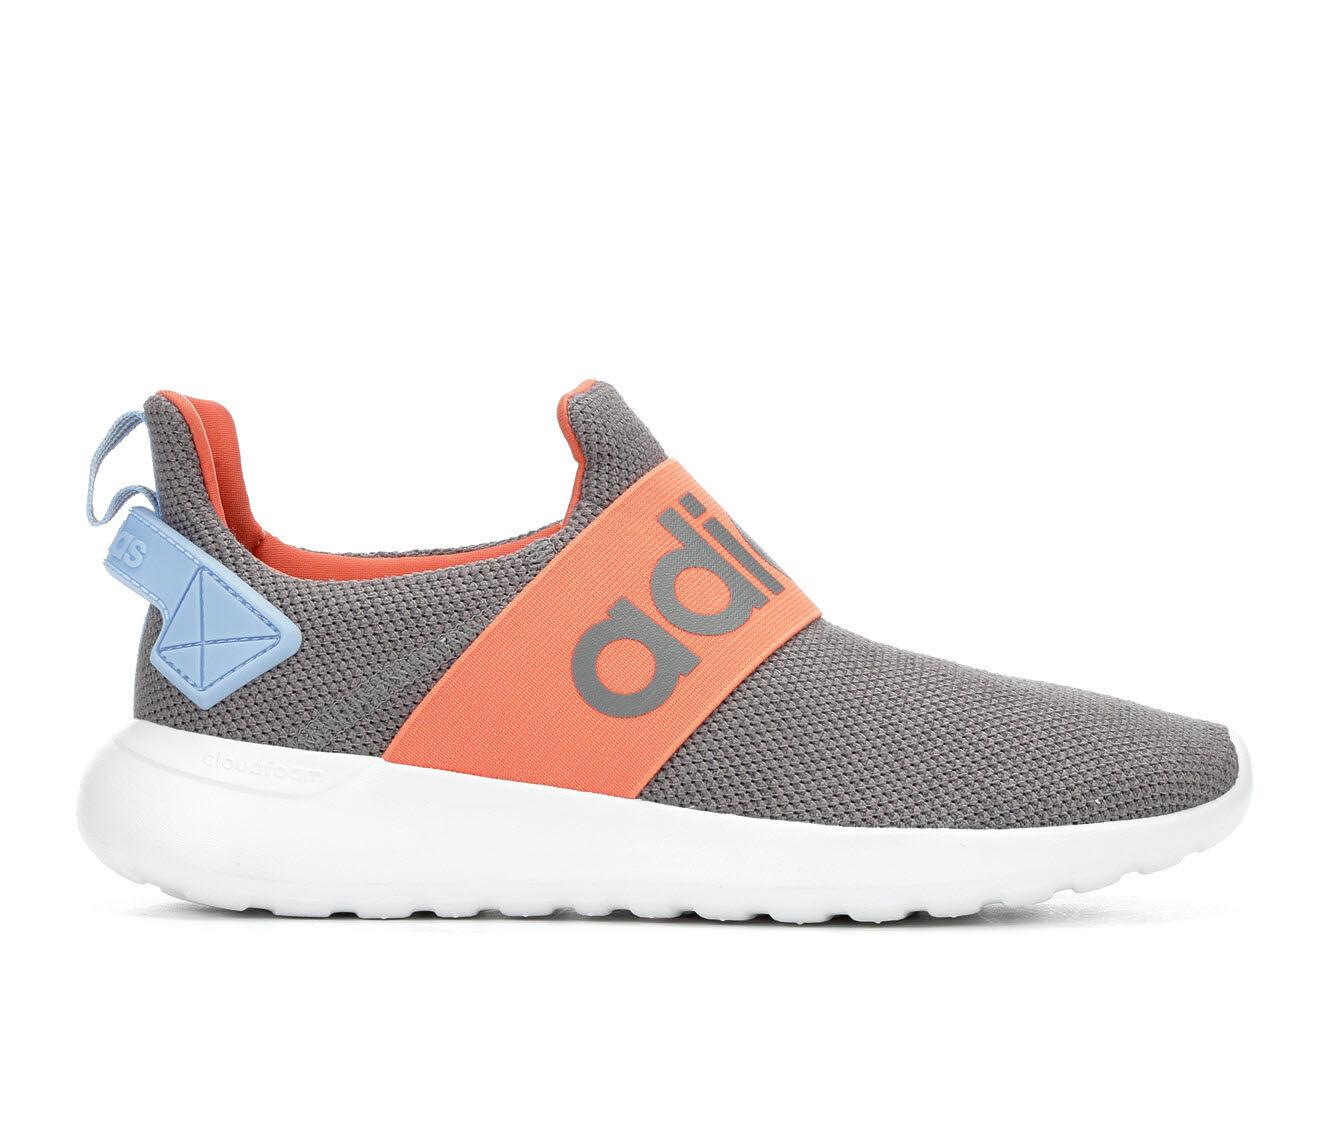 Women's Adidas Lite Racer Adapt Slip-On Sneakers Gry/Orange/Blue